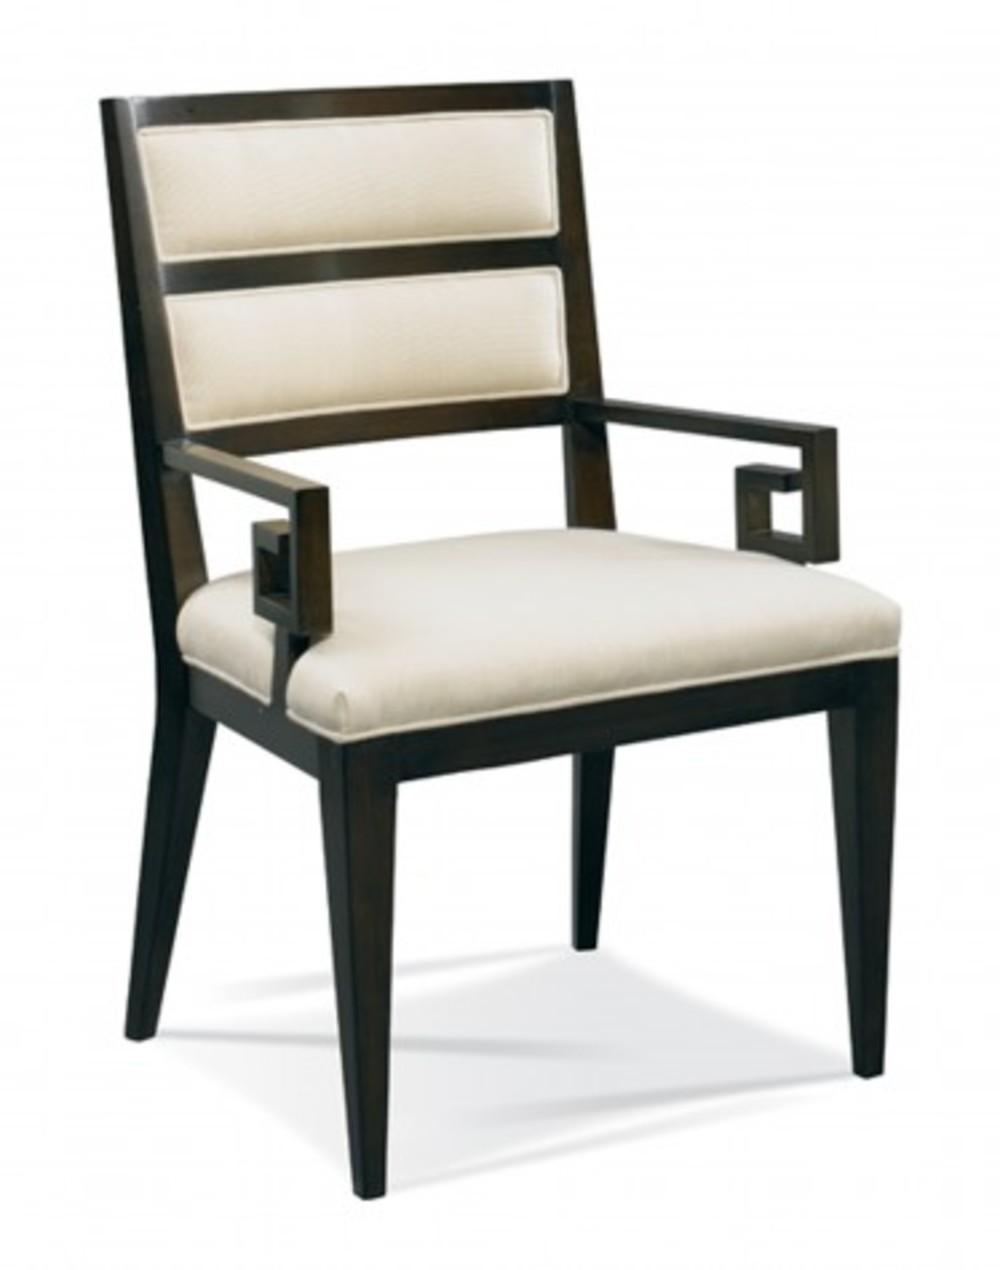 Hickory White - Greek Key Arm Chair